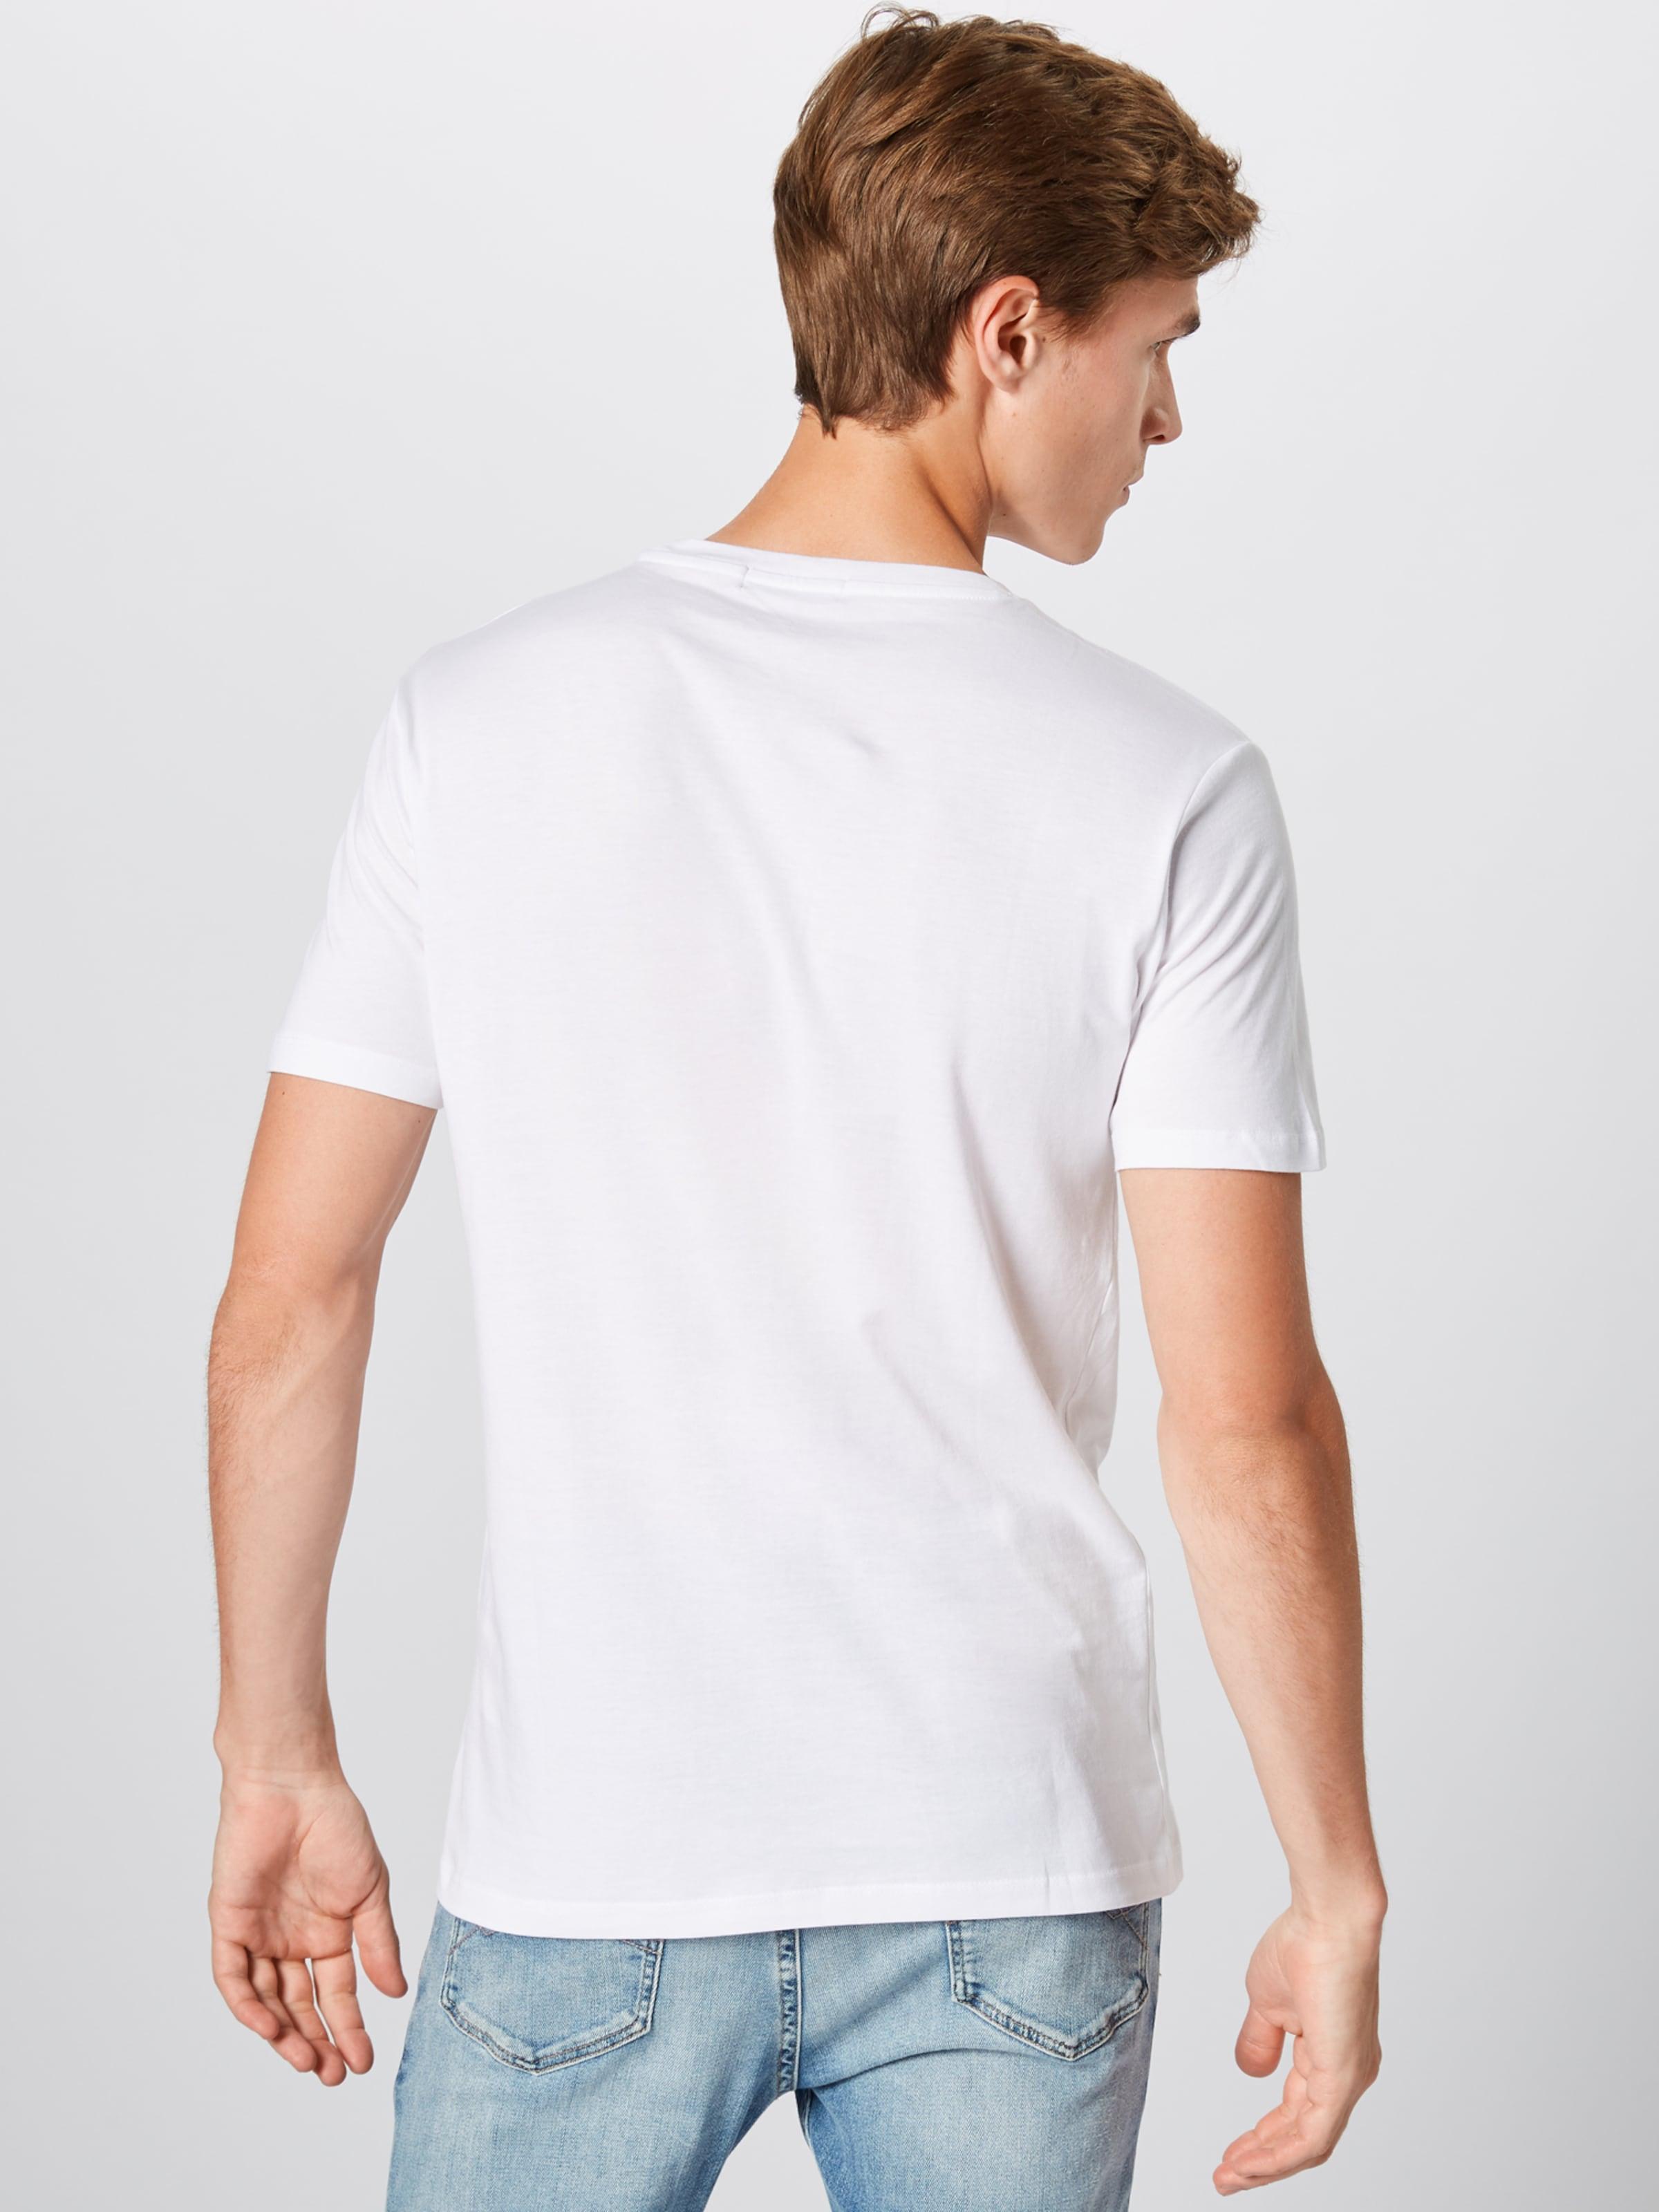 T Replay En Replay Blanc T shirt shirt nwk8OX0P